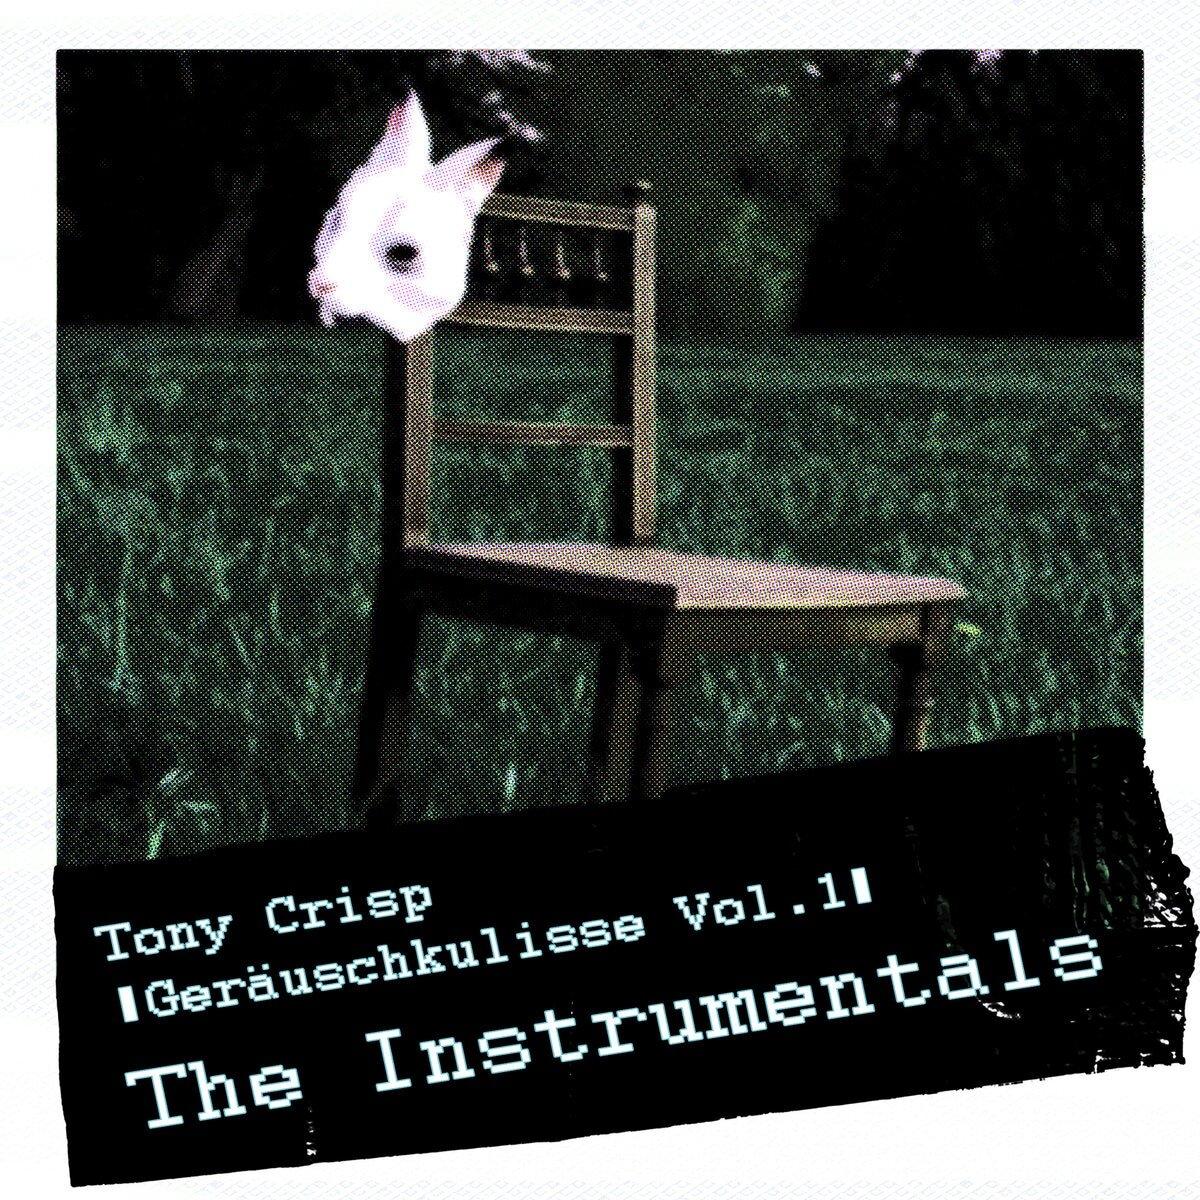 Geräuschkulisse Vol. 1 (The Instrumentals)